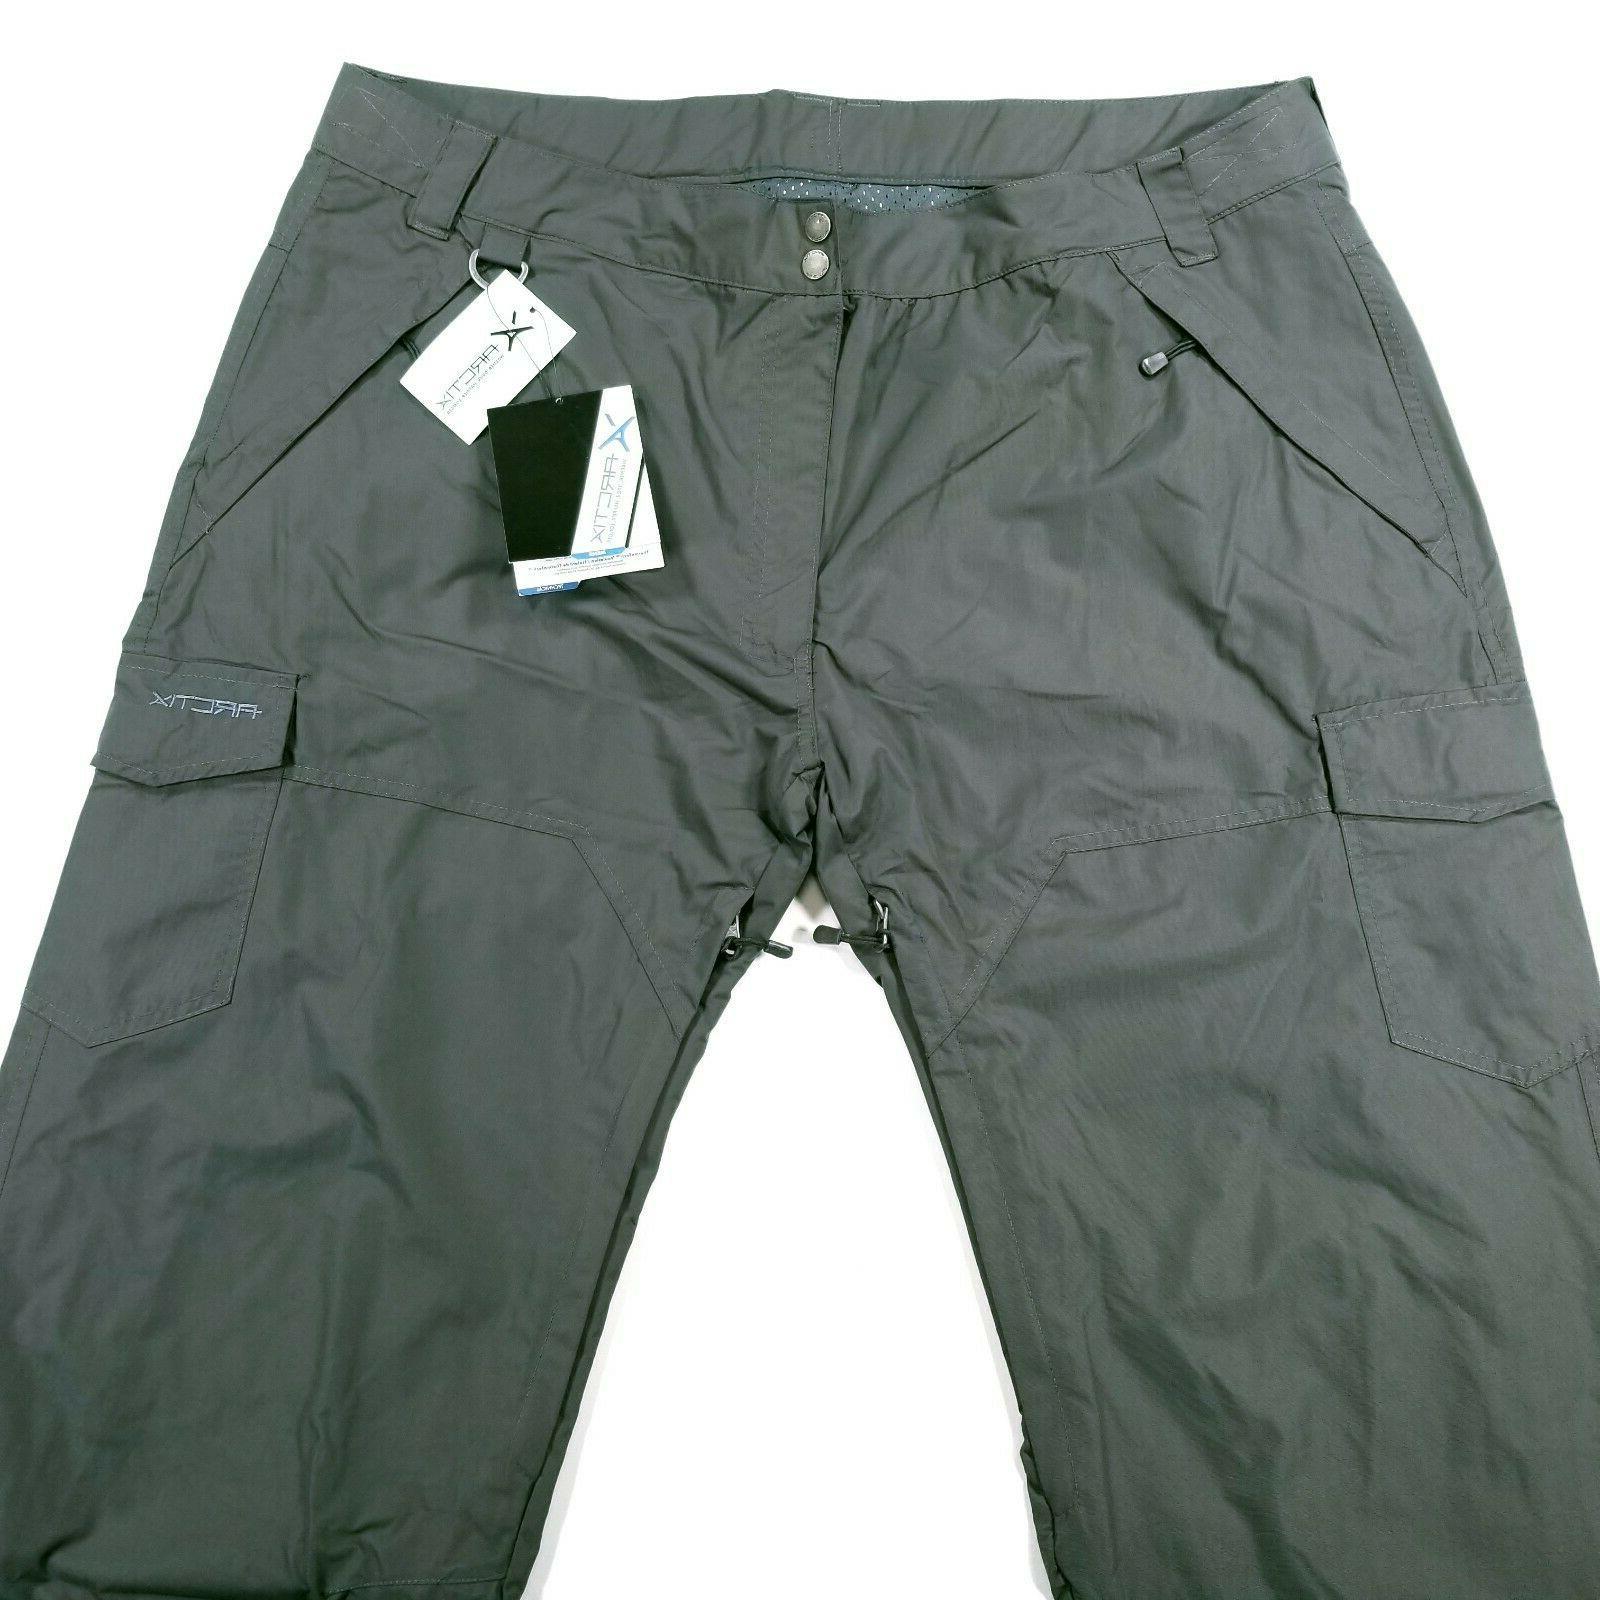 Arctix Mens Snowboard Pants Gray Vented Button Zip Closer